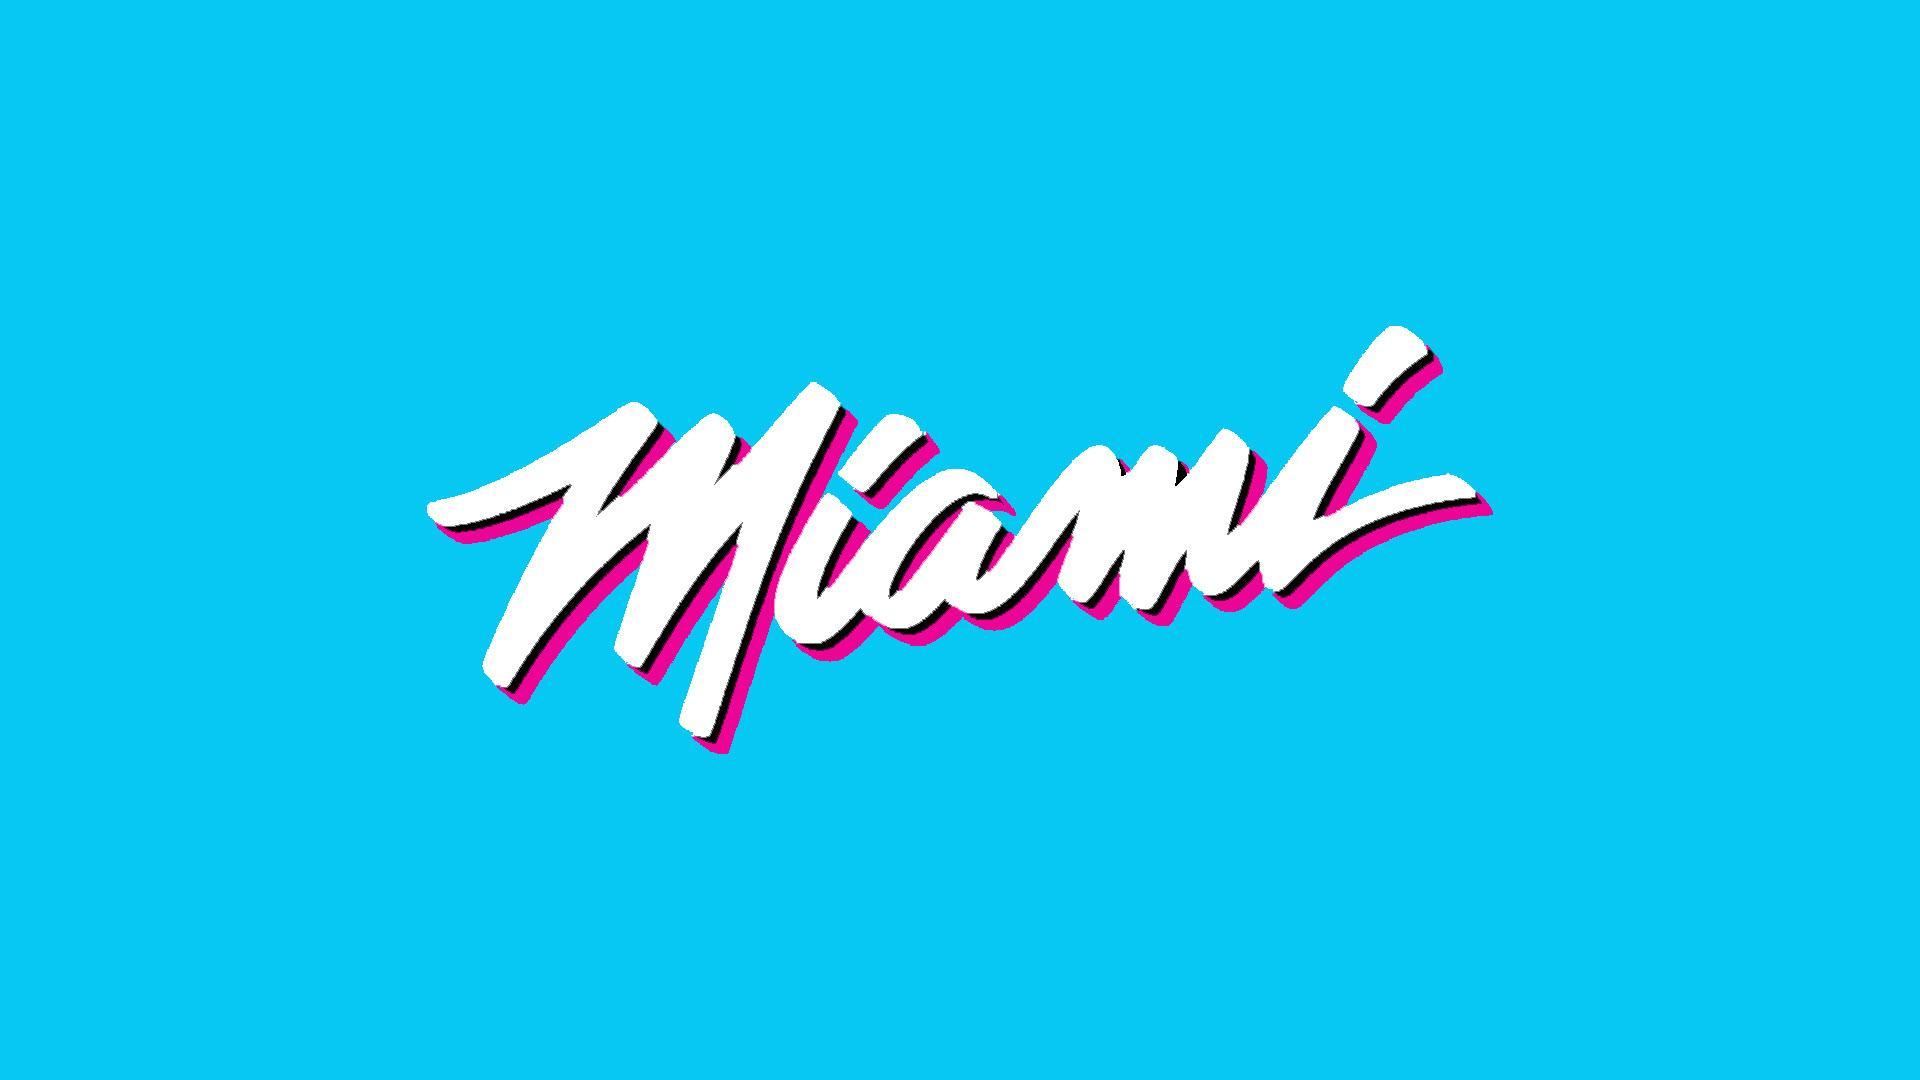 Miami Heat Vice - PS4Wallpapers.com